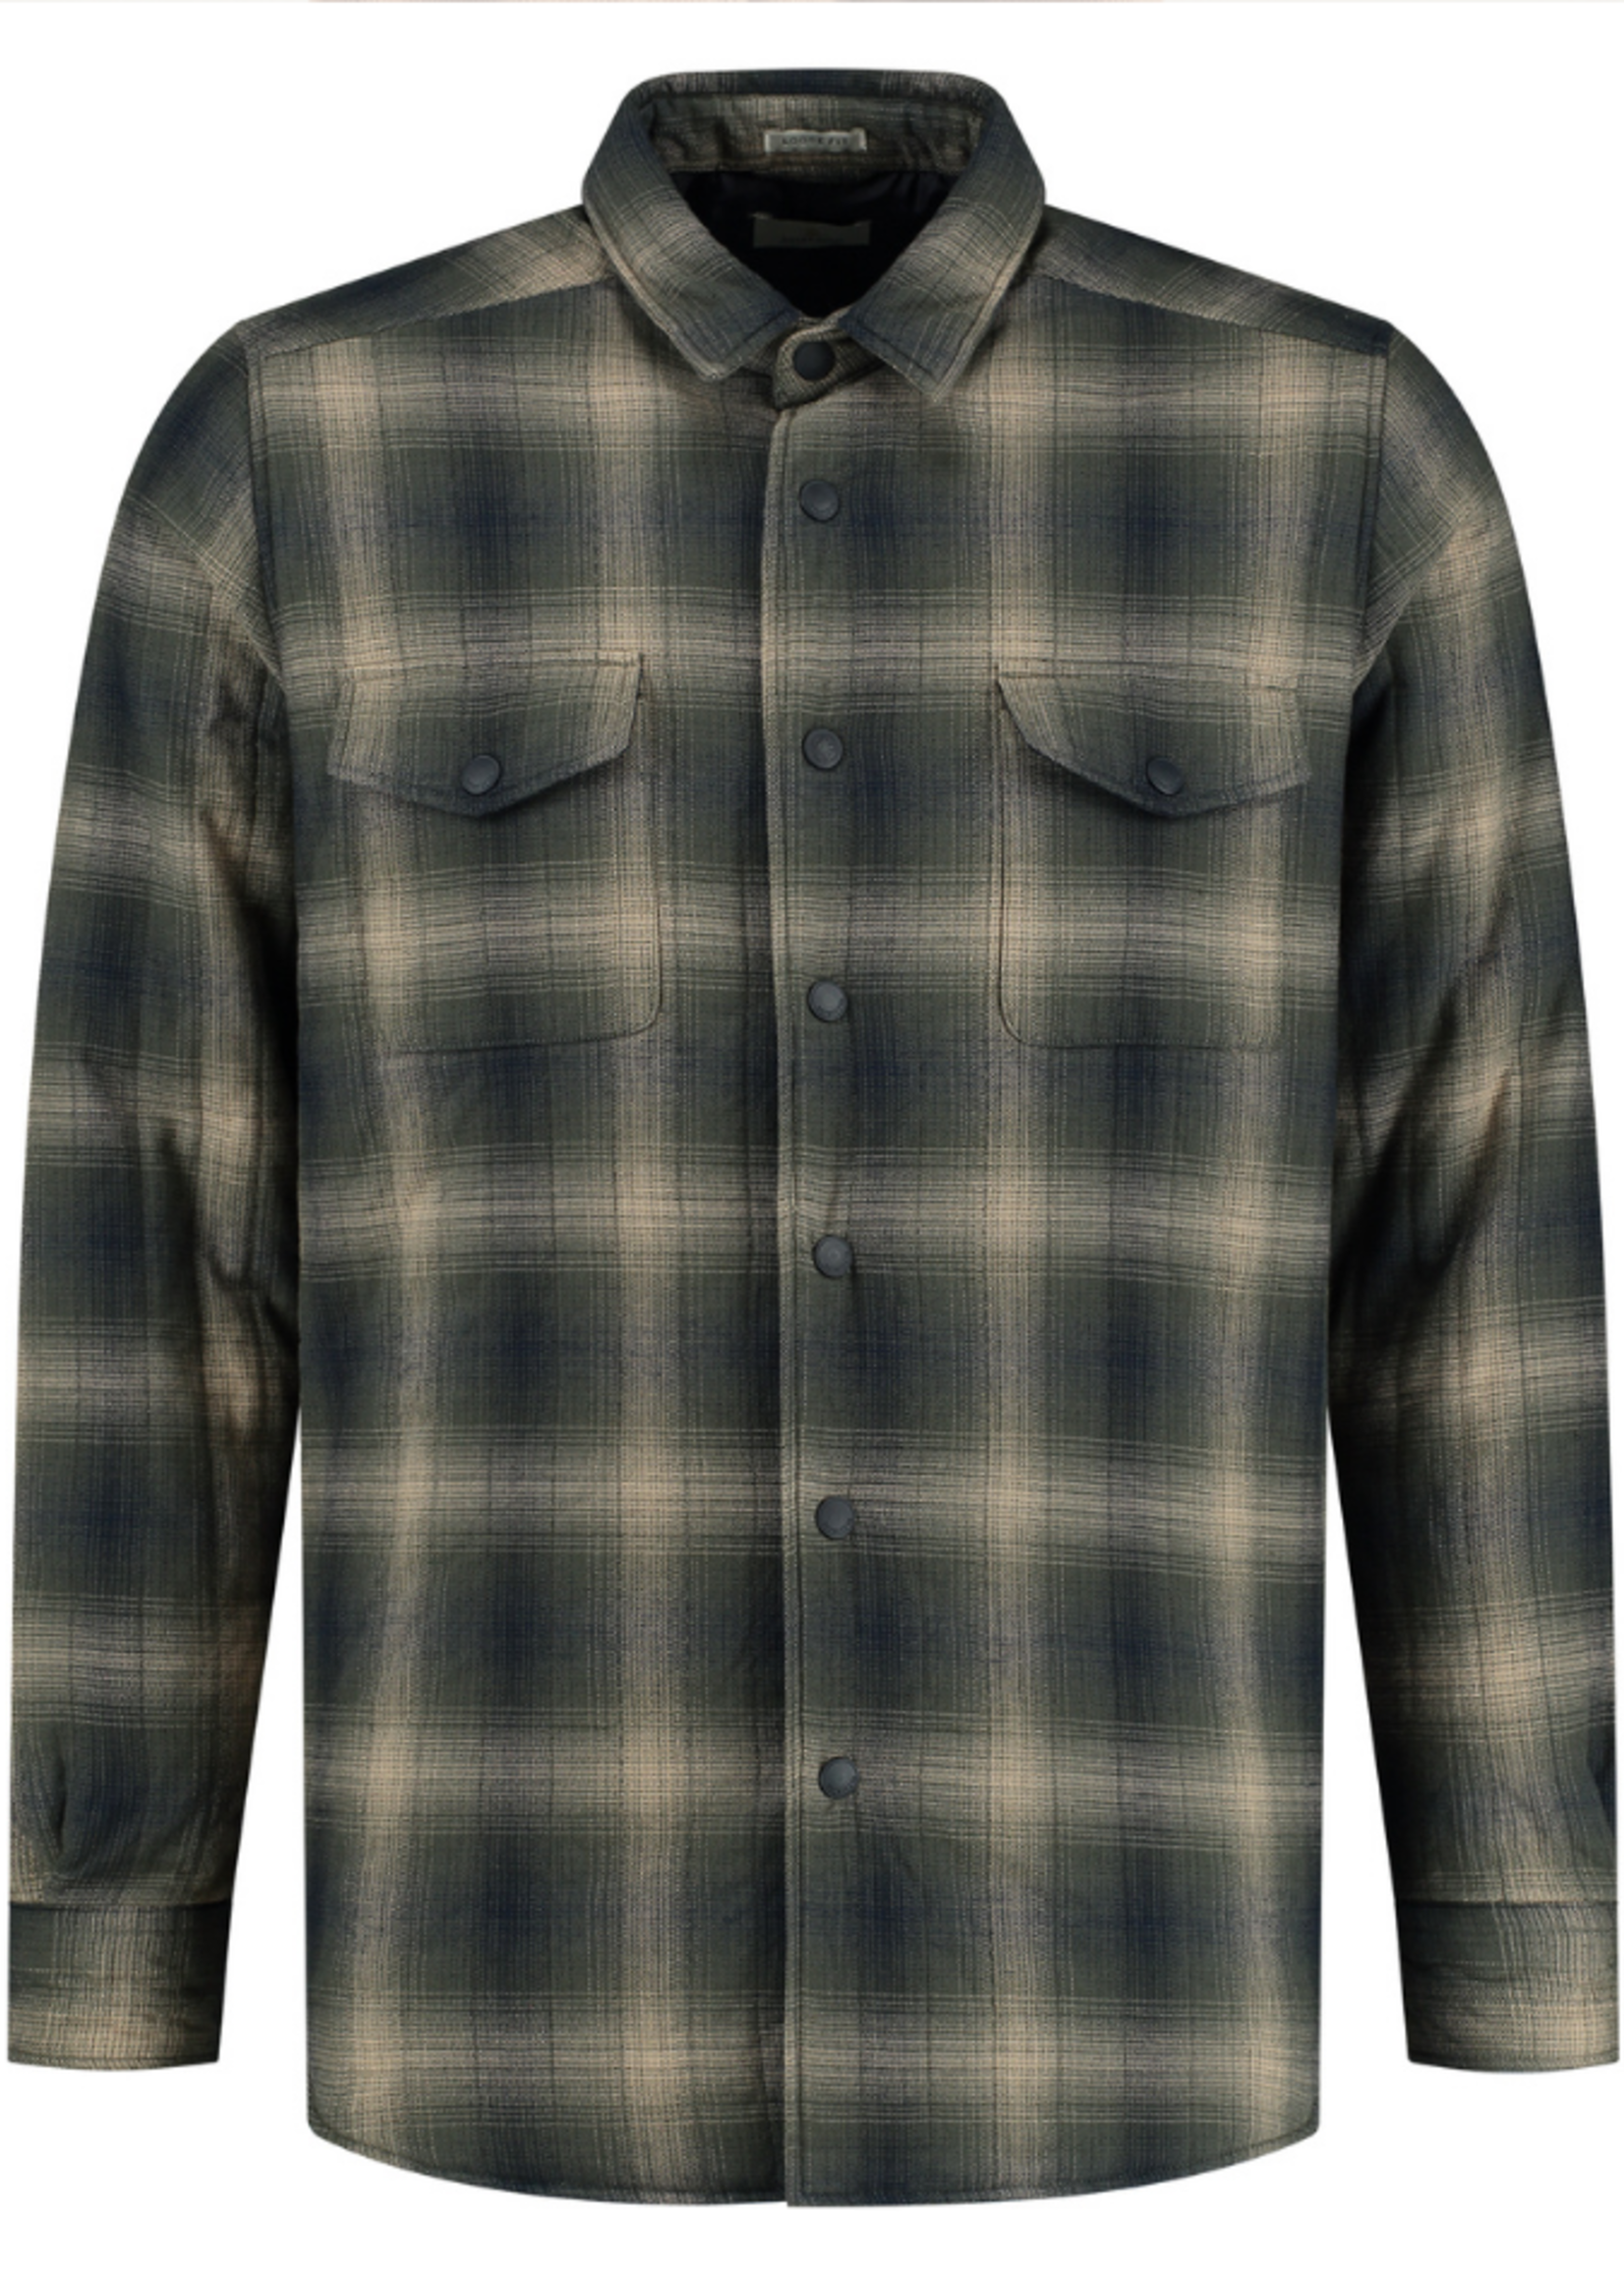 Dstrezzed Shirt Jacket Shadow Check